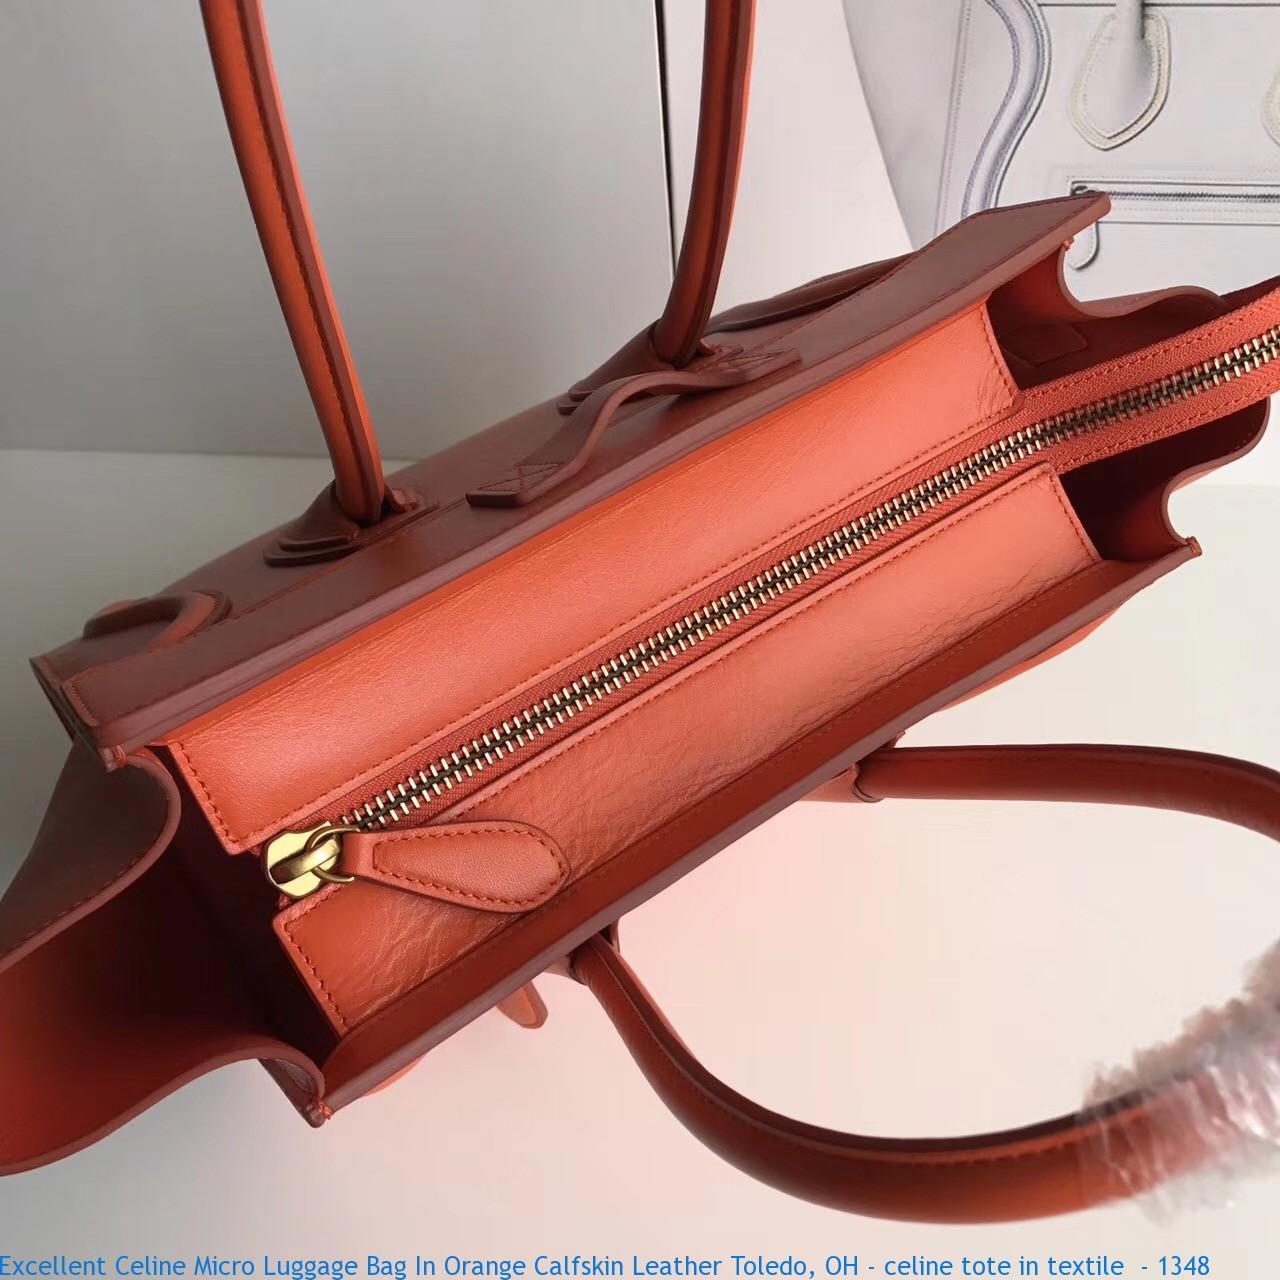 Excellent Celine Micro Luggage Bag